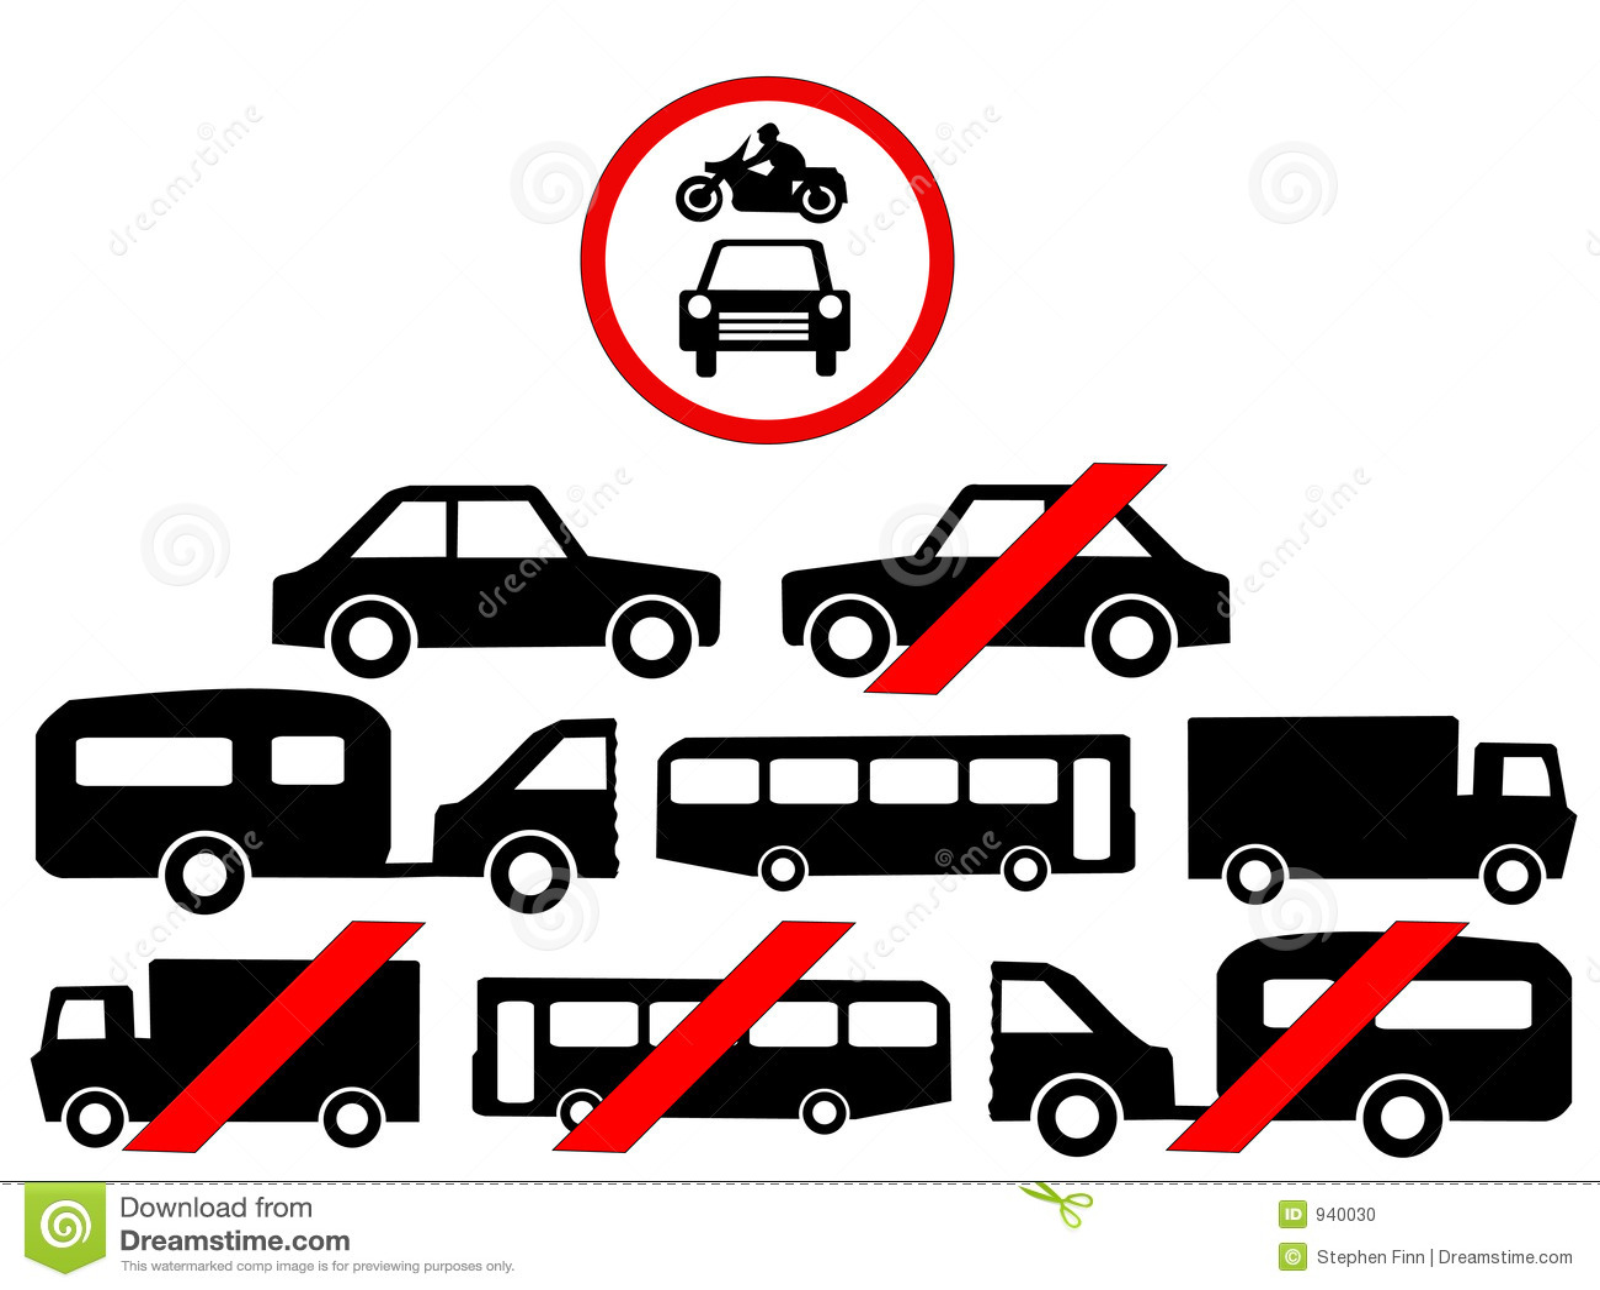 Vehicle Symbols Stock Vector Illustration Of Cycle Motor 940030